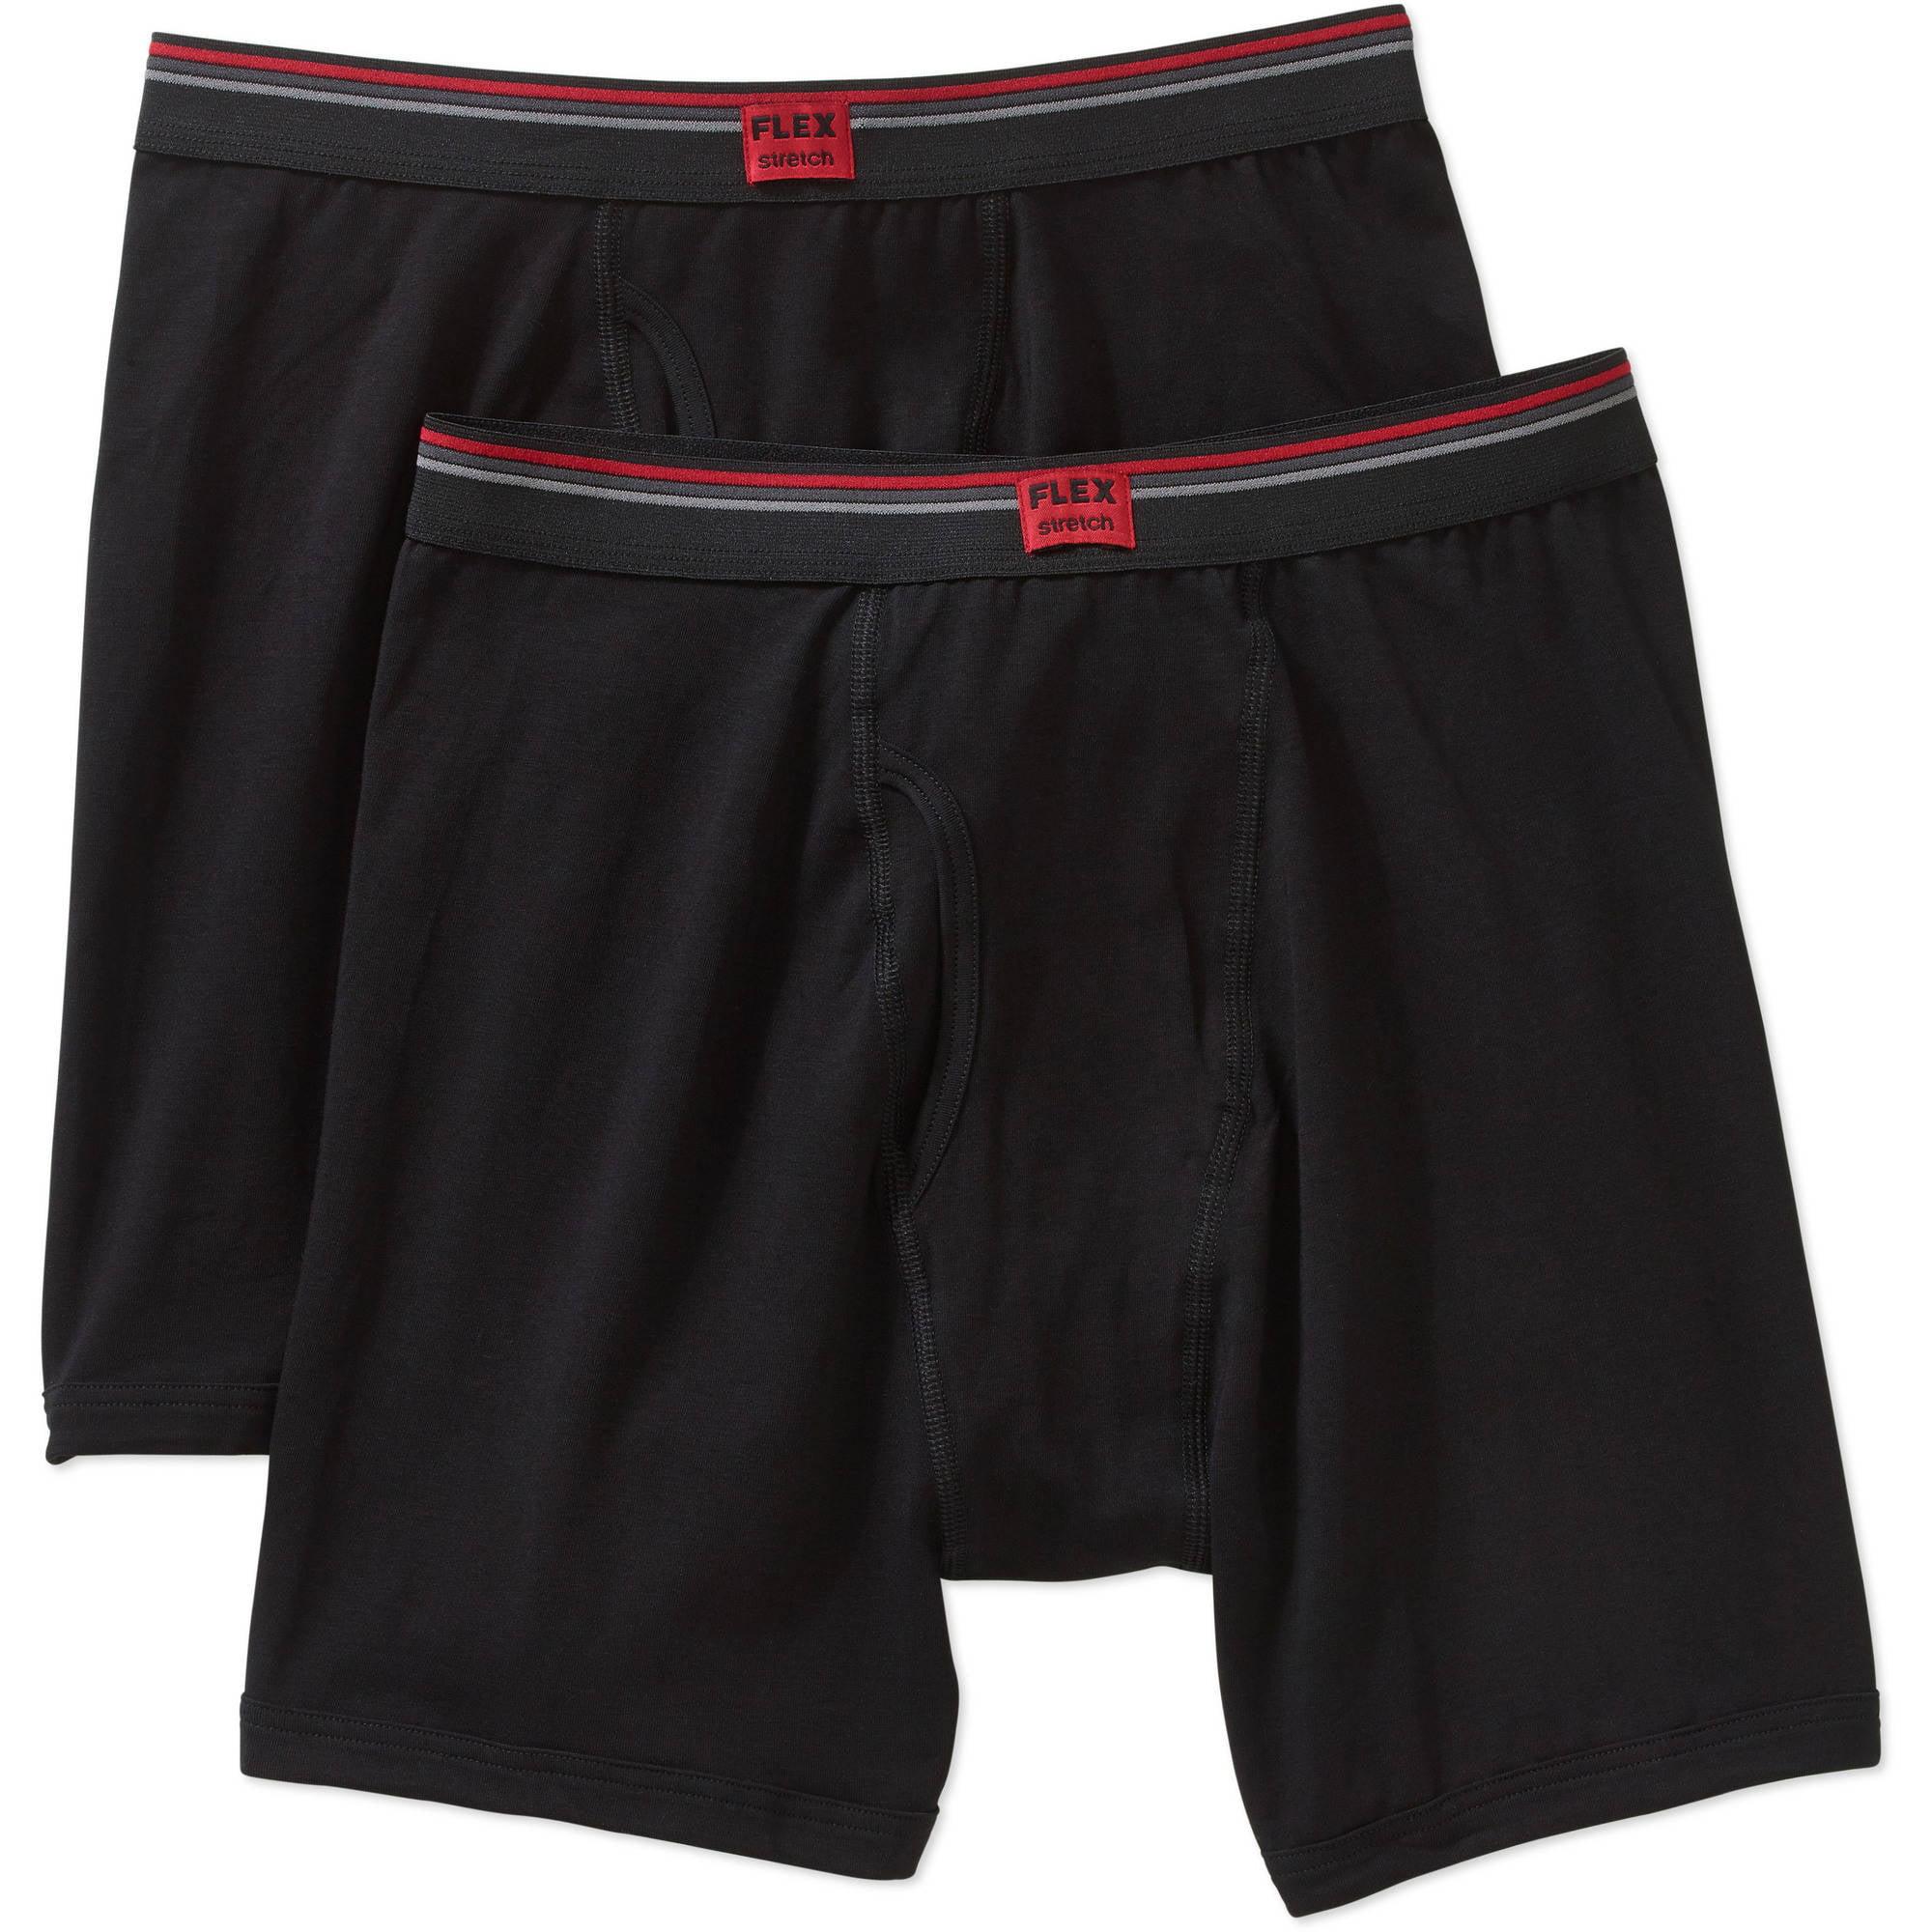 Life by Jockey Men's flex black cotton stretch long leg boxer brief, 2 pack by JOCKEY INTERNATIONAL INC